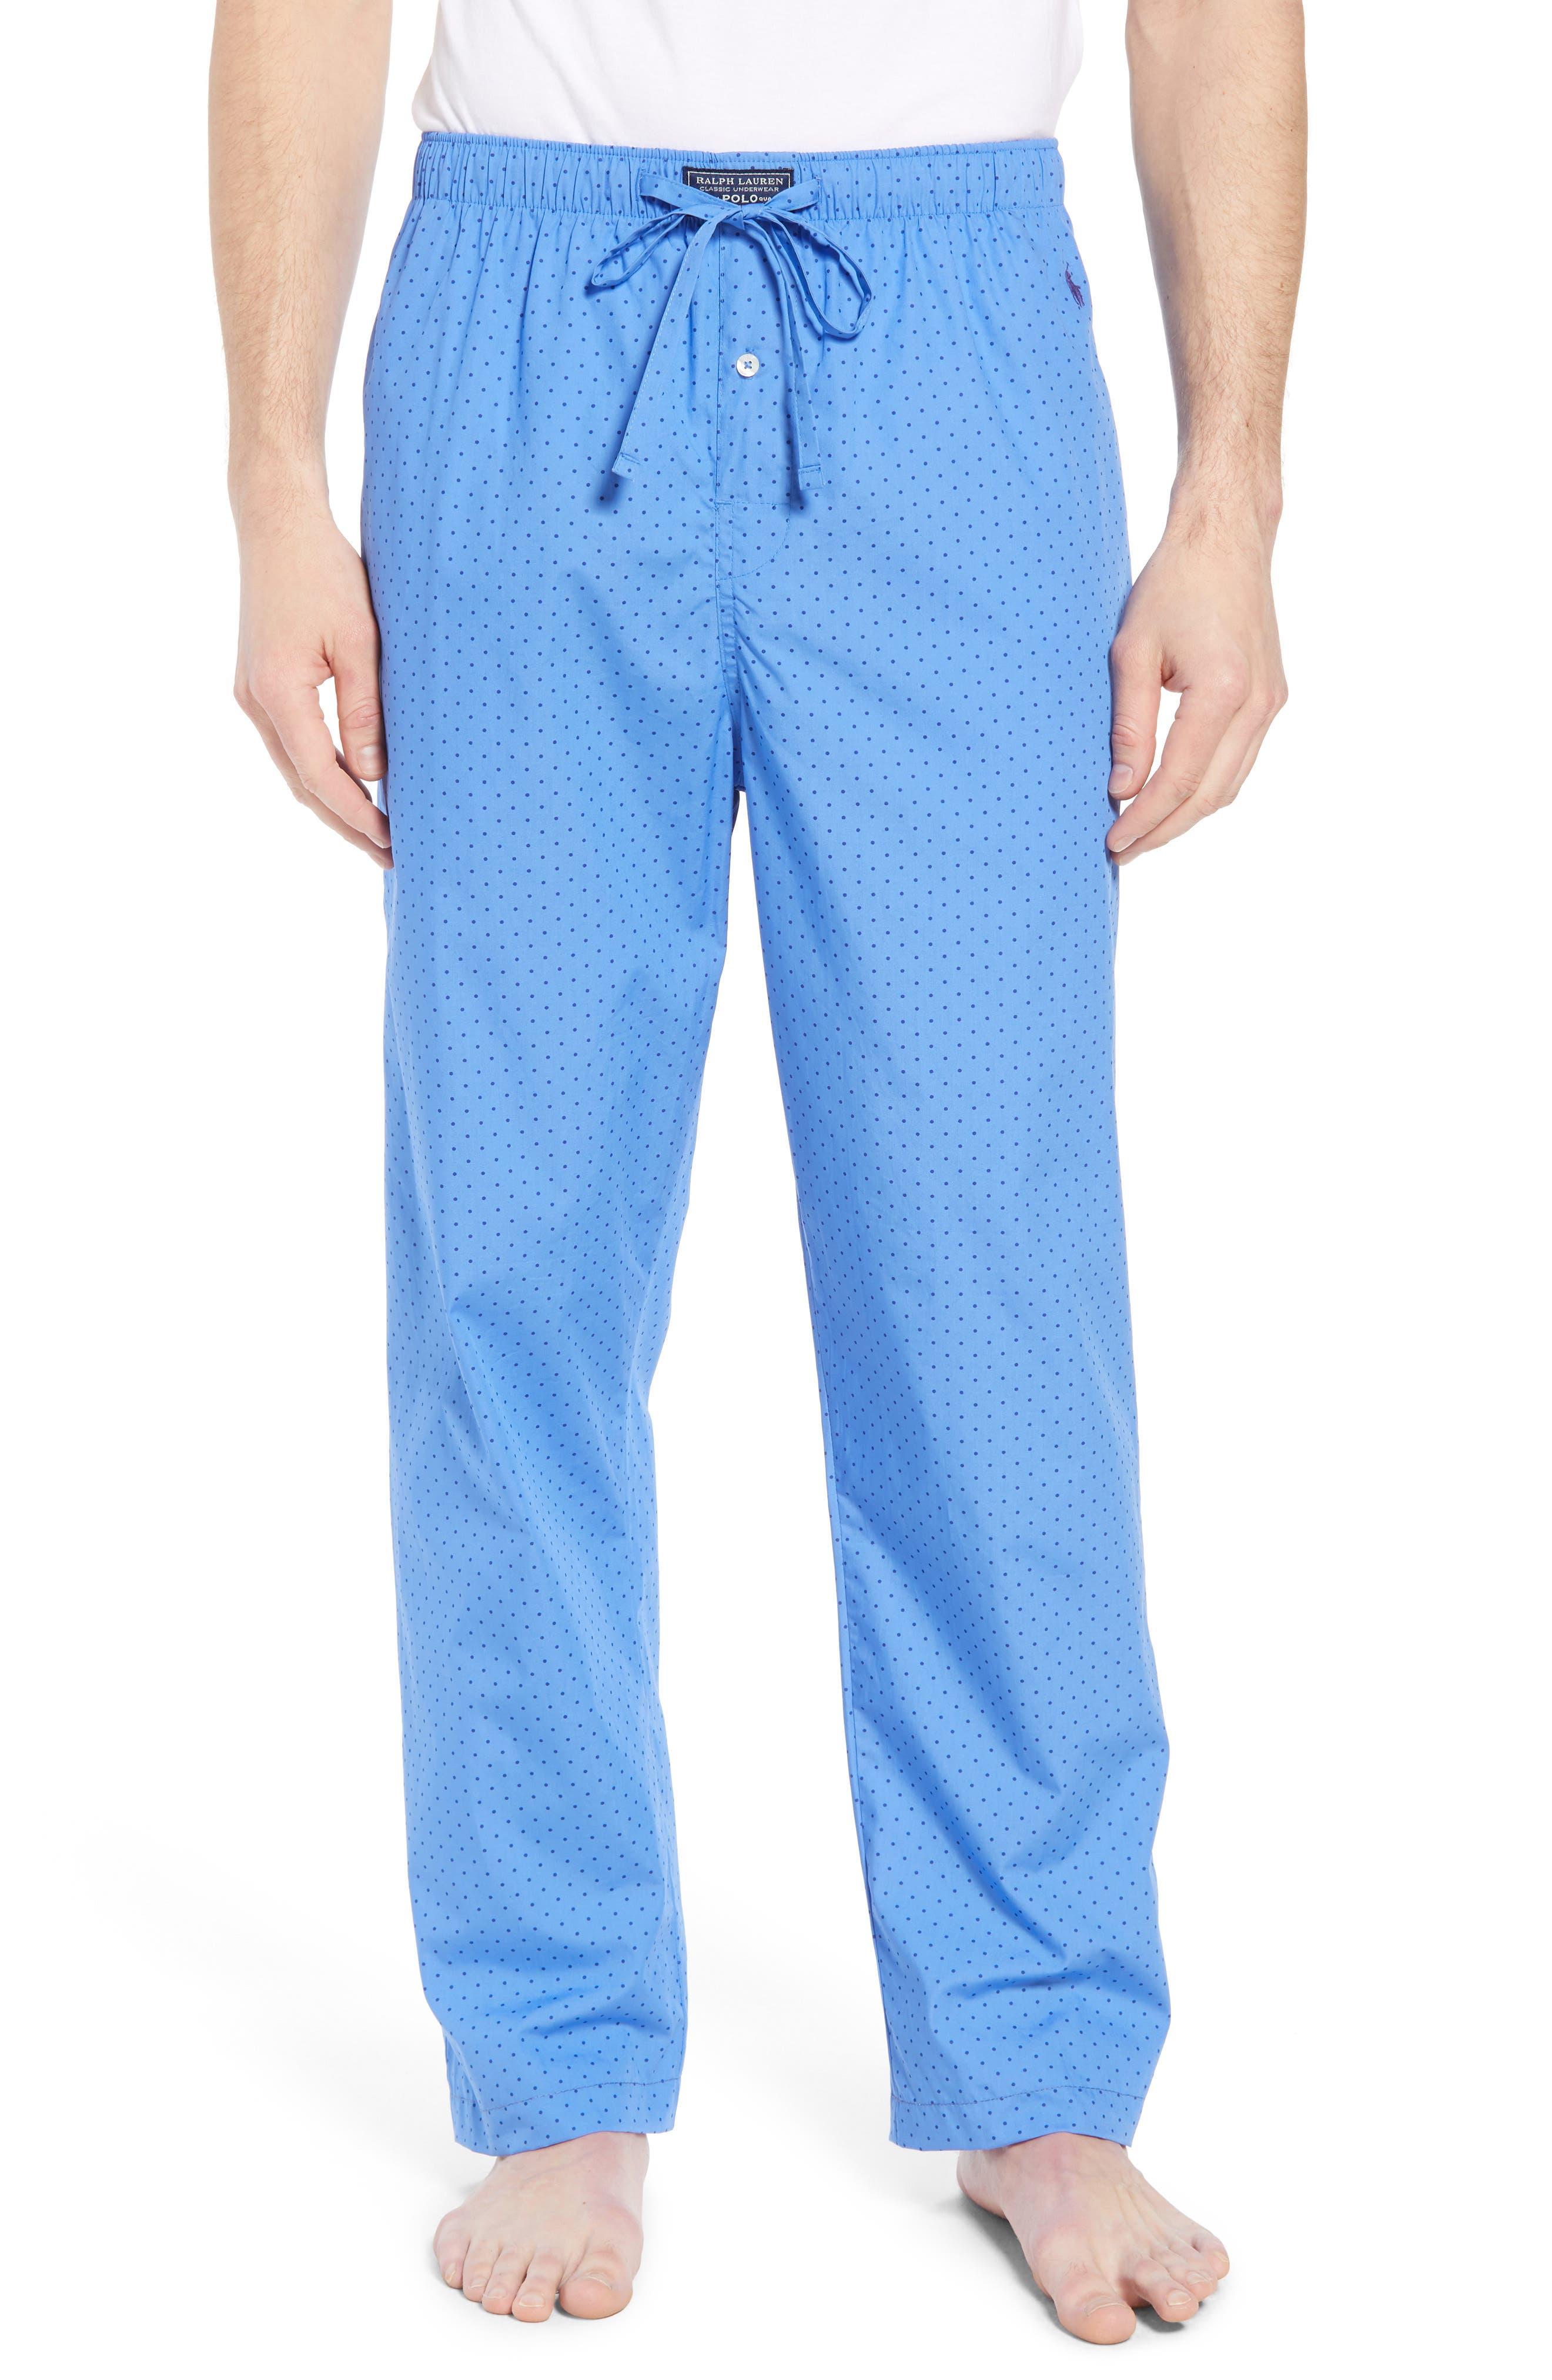 Dot Cotton Pajama Pants,                         Main,                         color, 451